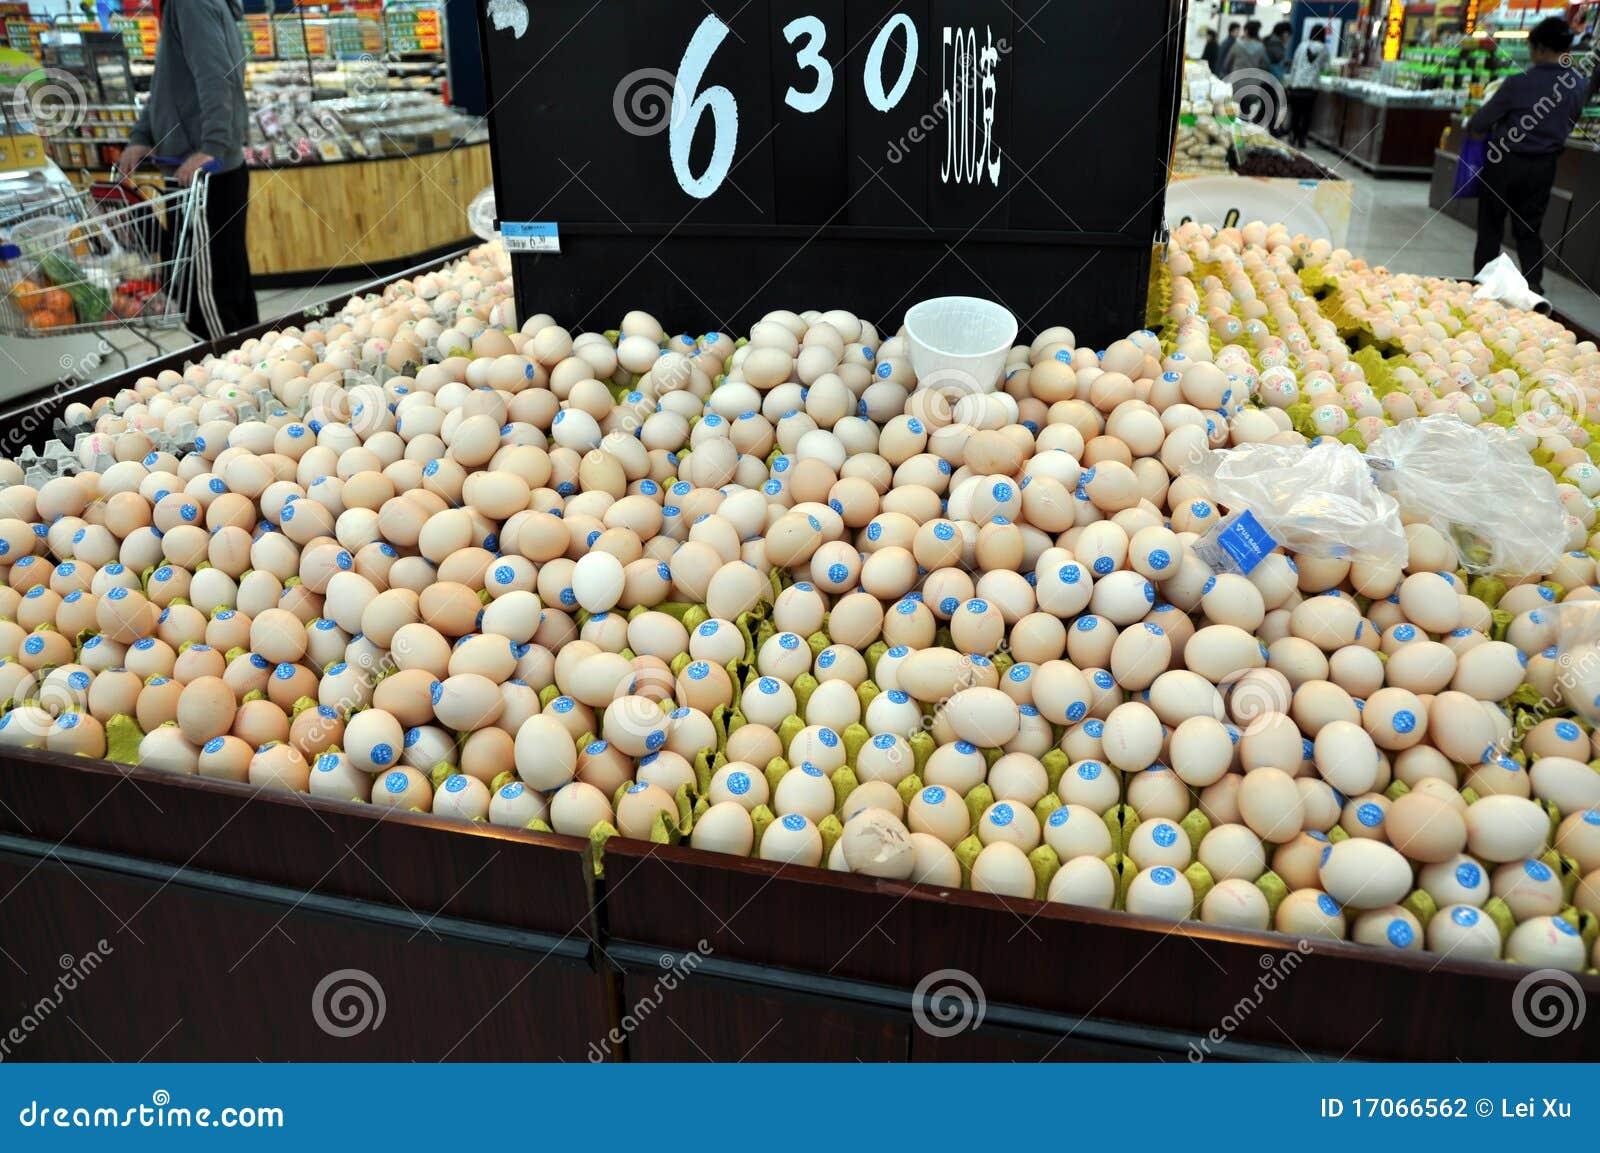 Walmart Corporate Contact >> Chengdu, China: Egg Display At Walmart Supermarket Editorial Photography - Image: 17066562